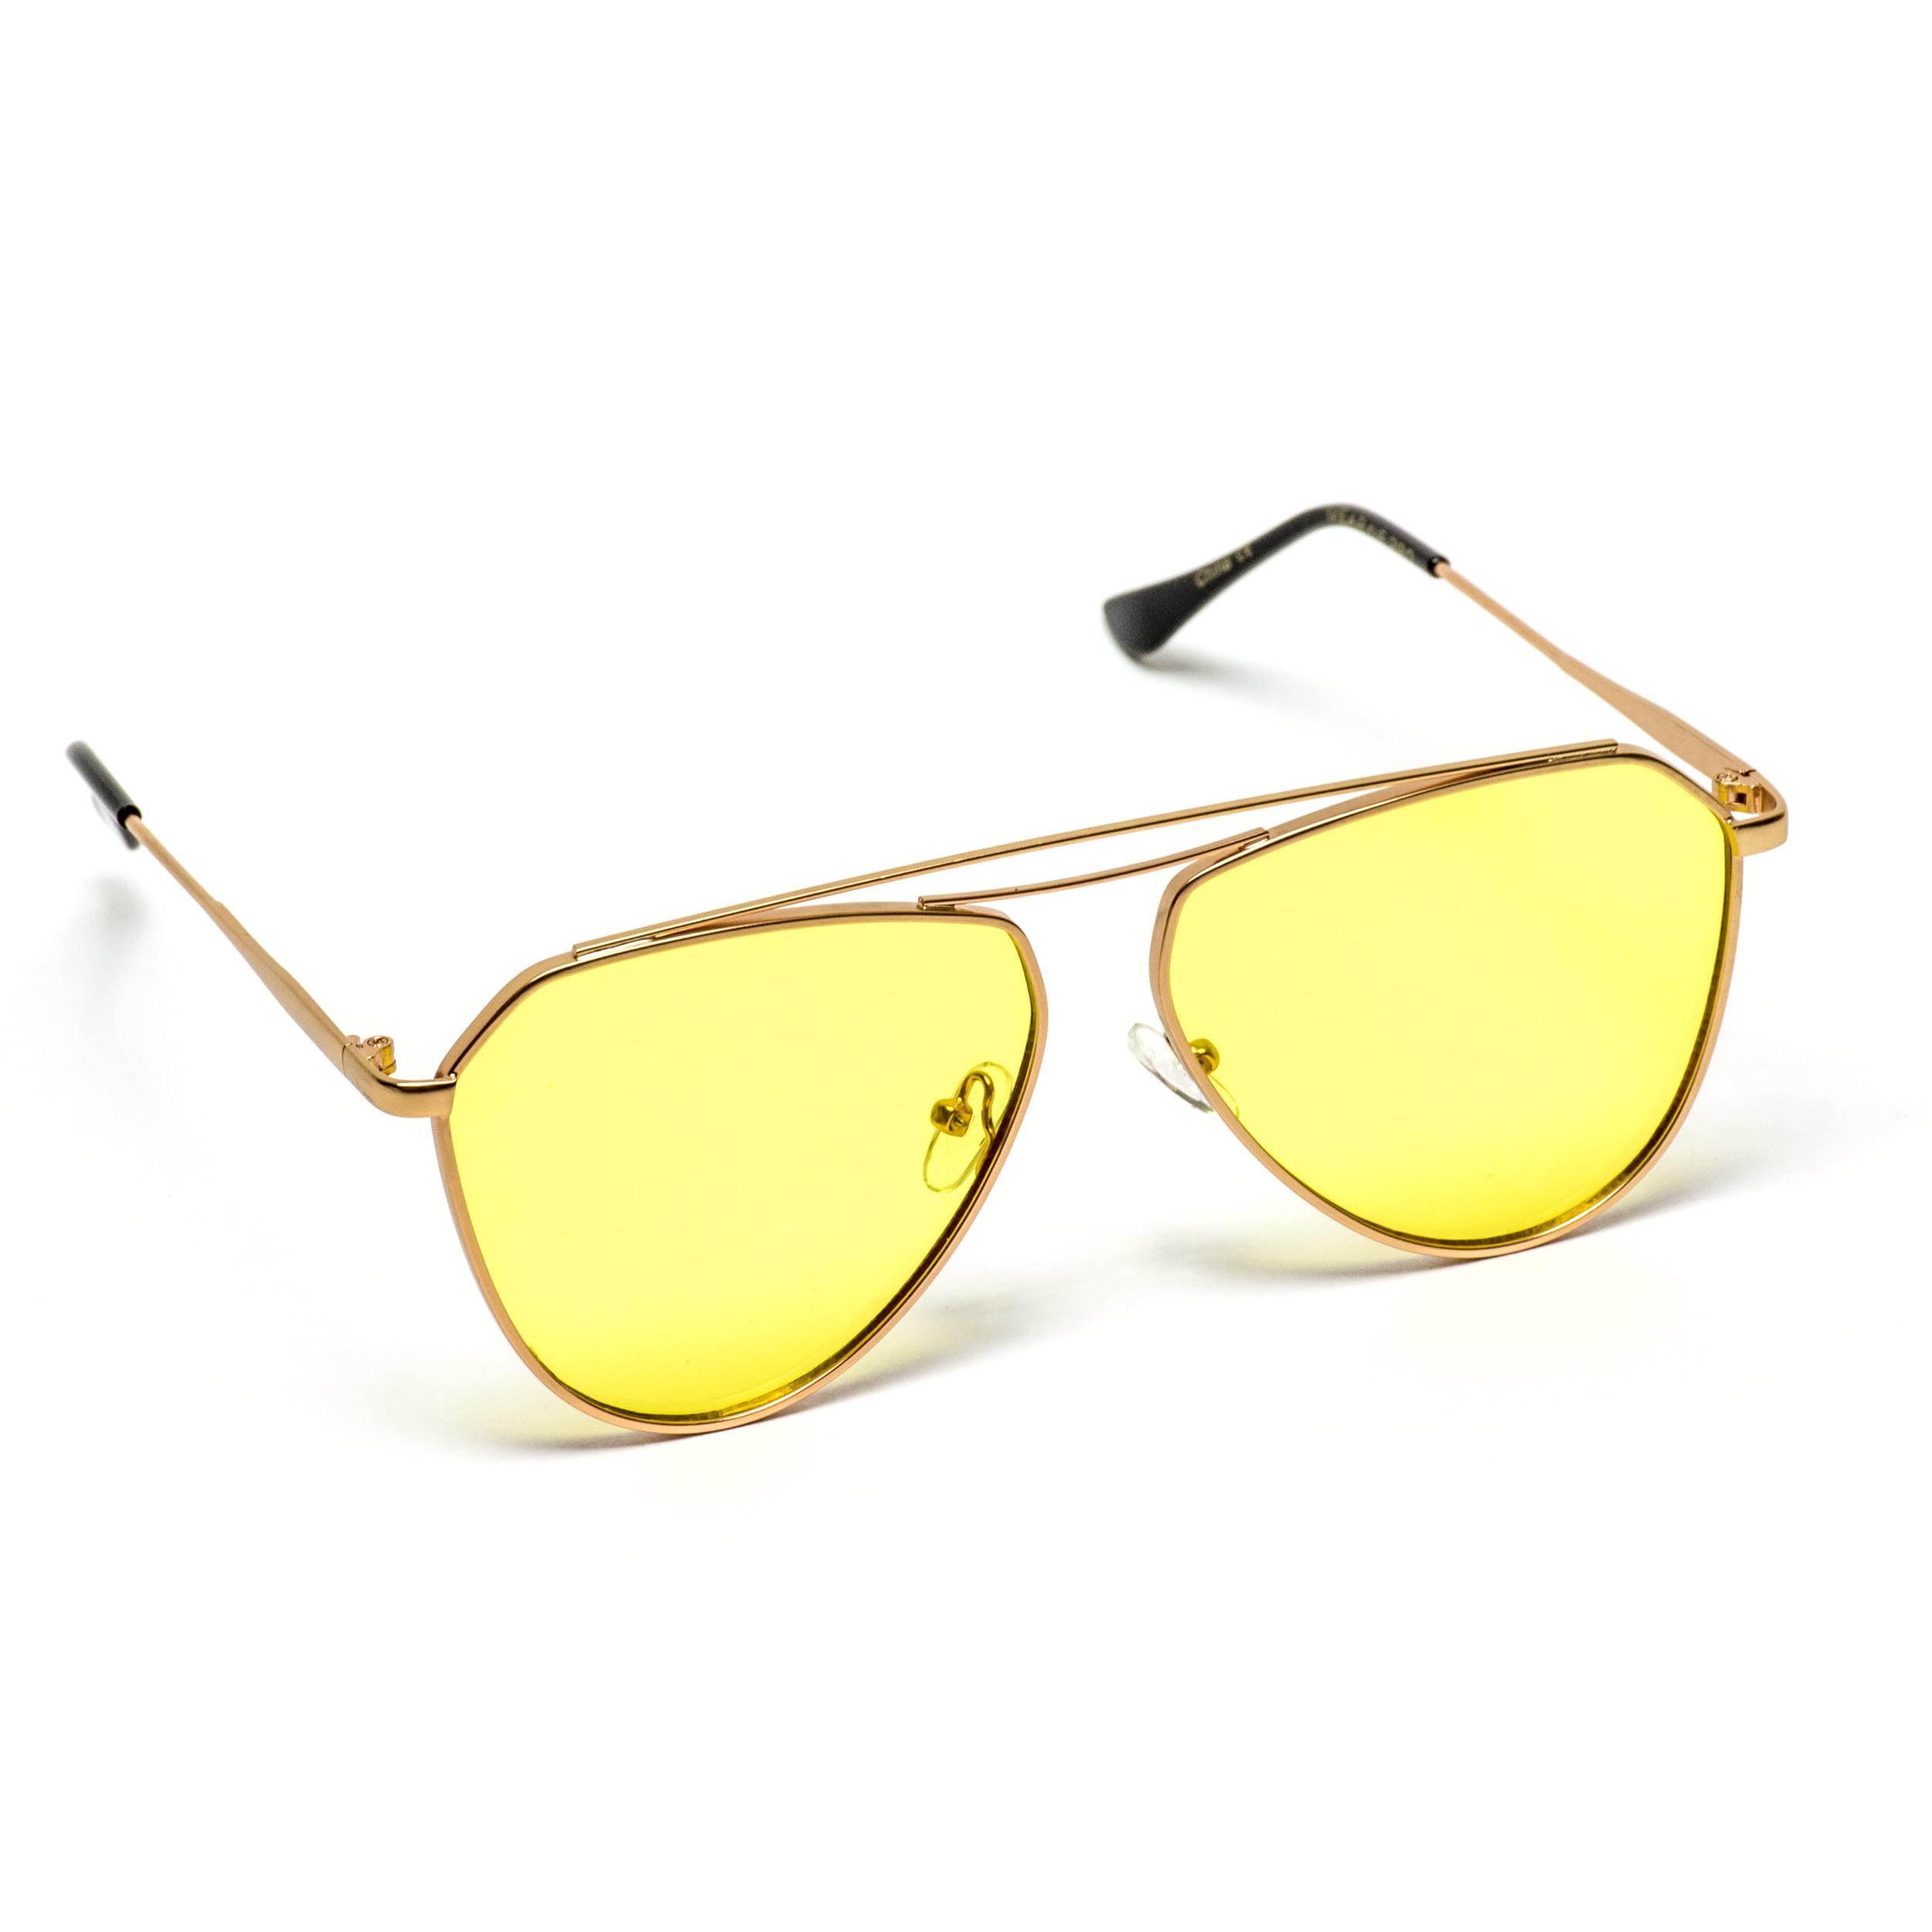 72ff7d82af WearMe Pro - WearMe Pro - Geometric Modern Metal Frame Flat Tinted Lens  Sunglasses - Walmart.com